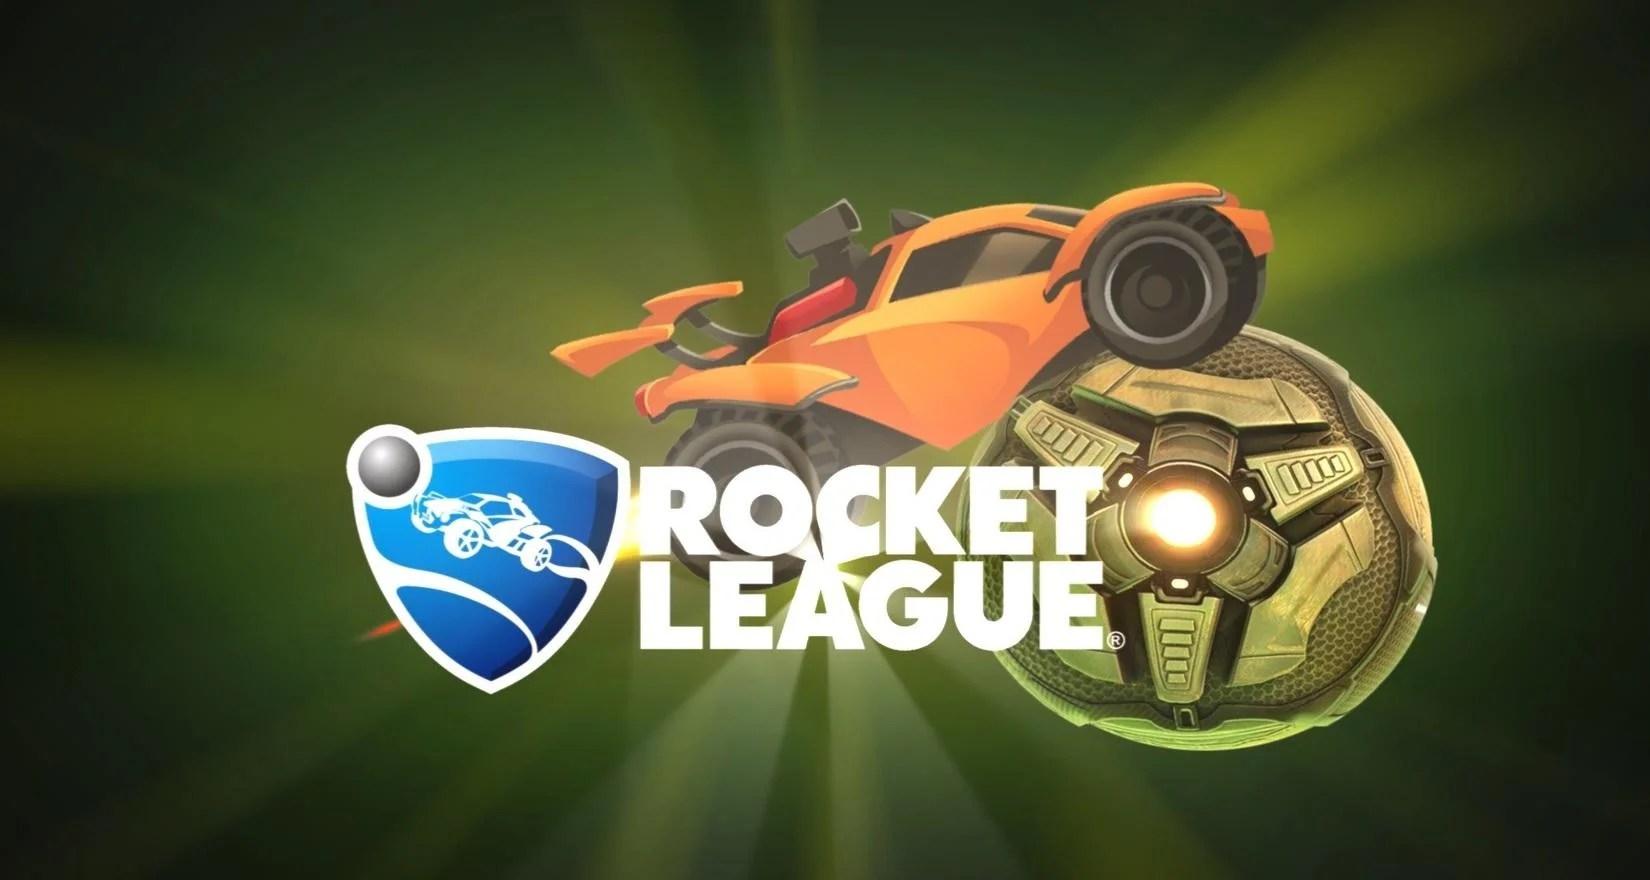 Super Fast Car Wallpaper Octane Is A Worms W M D All Star Rocket League